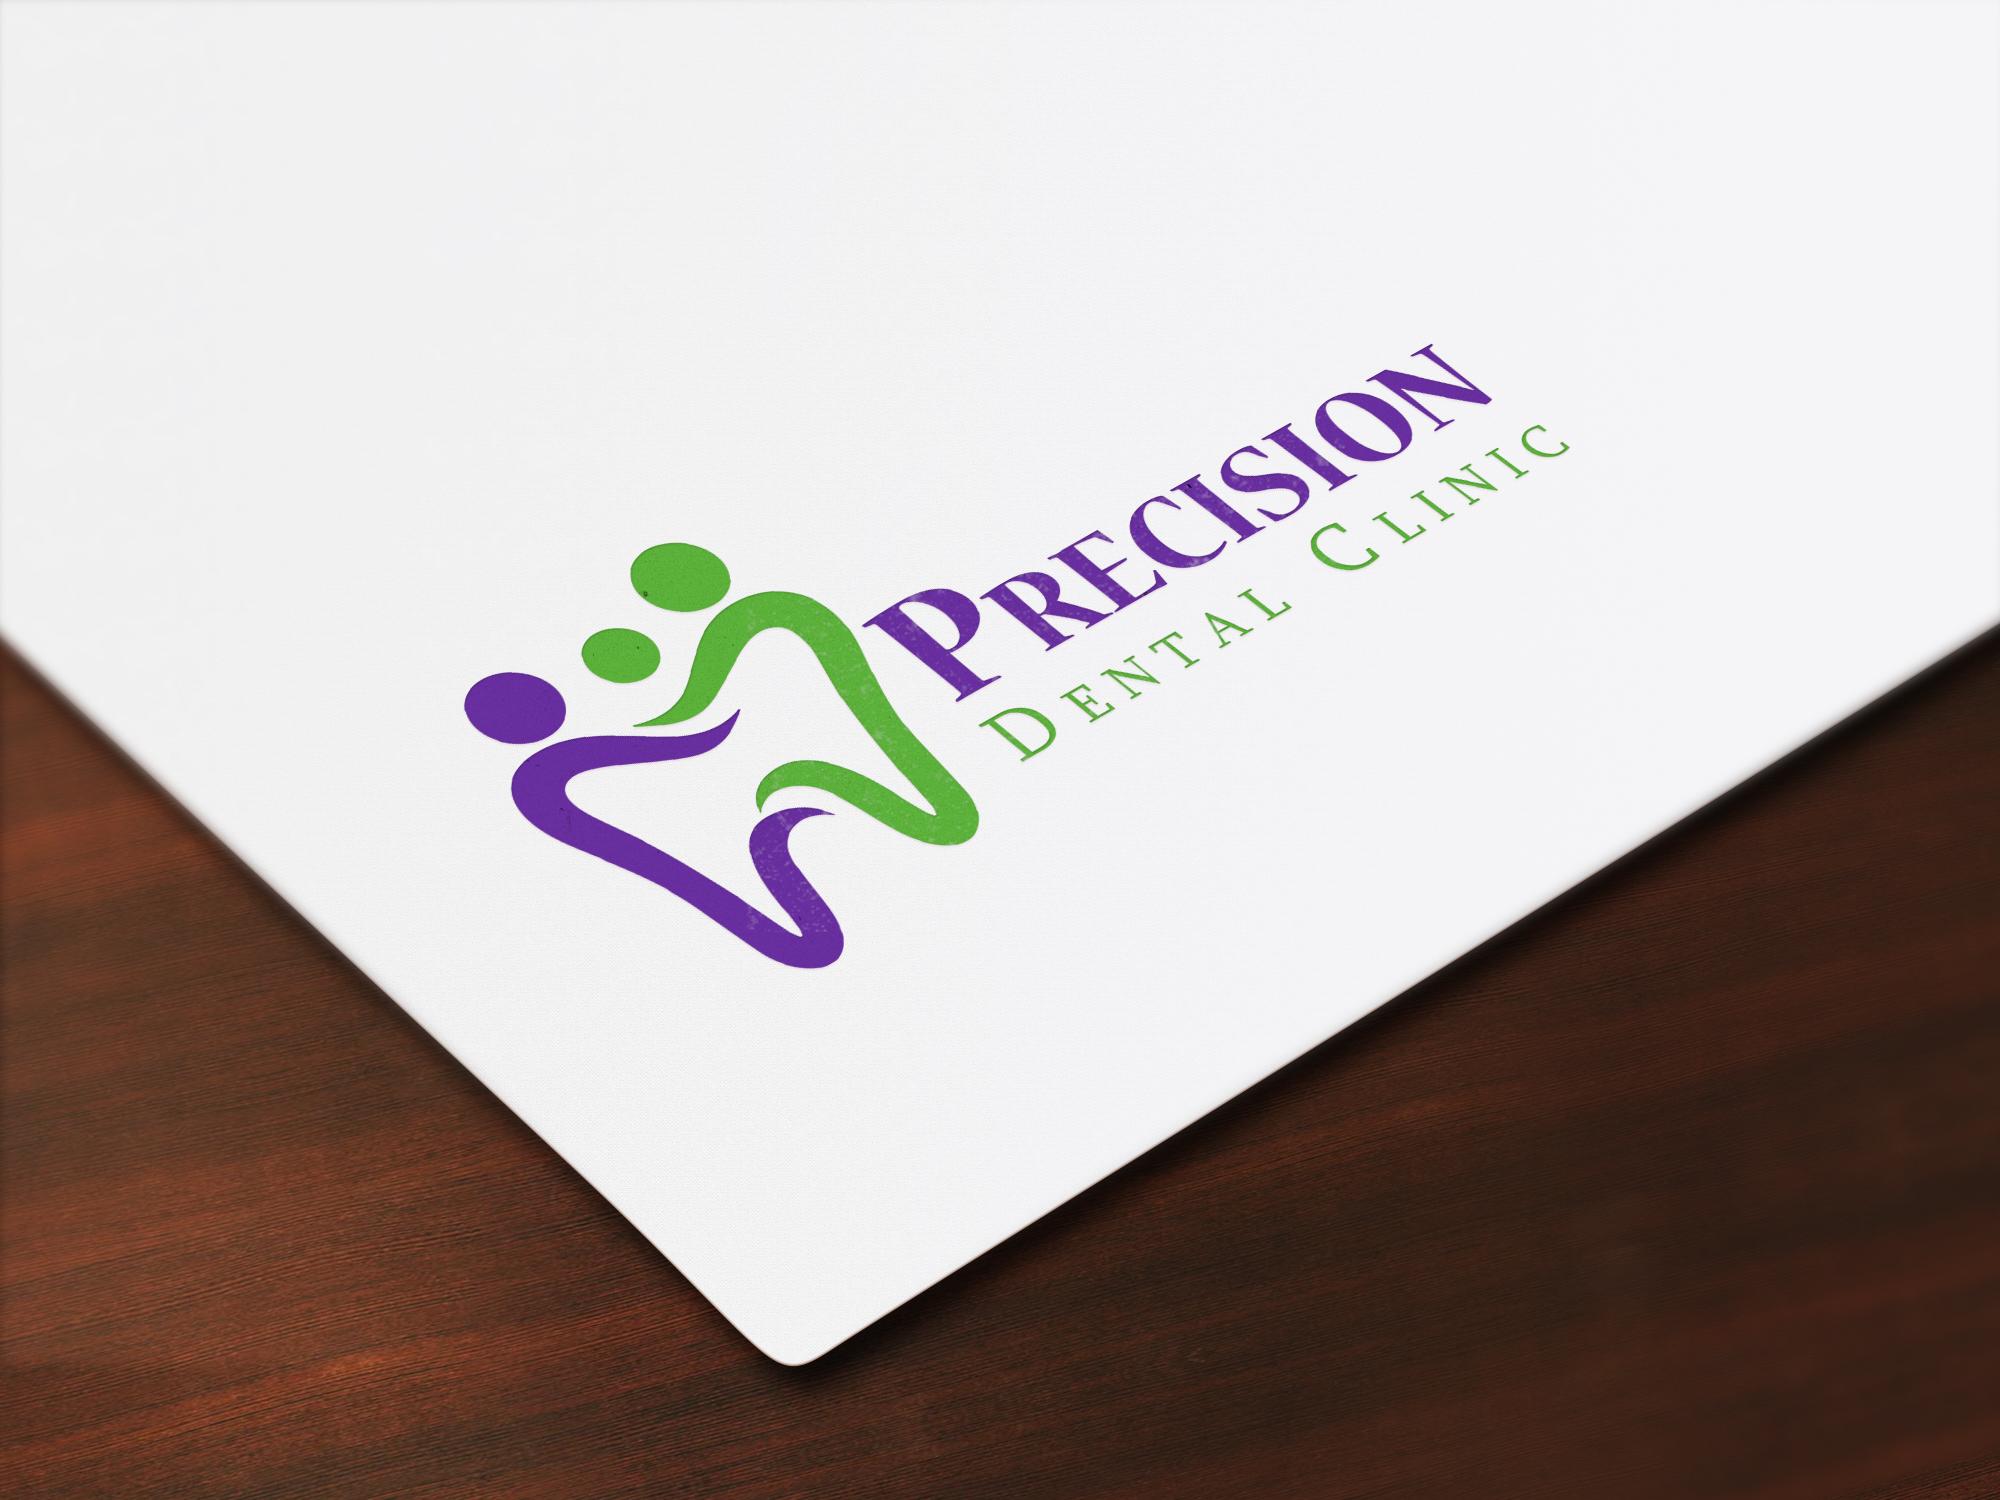 Logo Design by Muazzama Memon - Entry No. 163 in the Logo Design Contest Captivating Logo Design for Precision Dental Clinic.